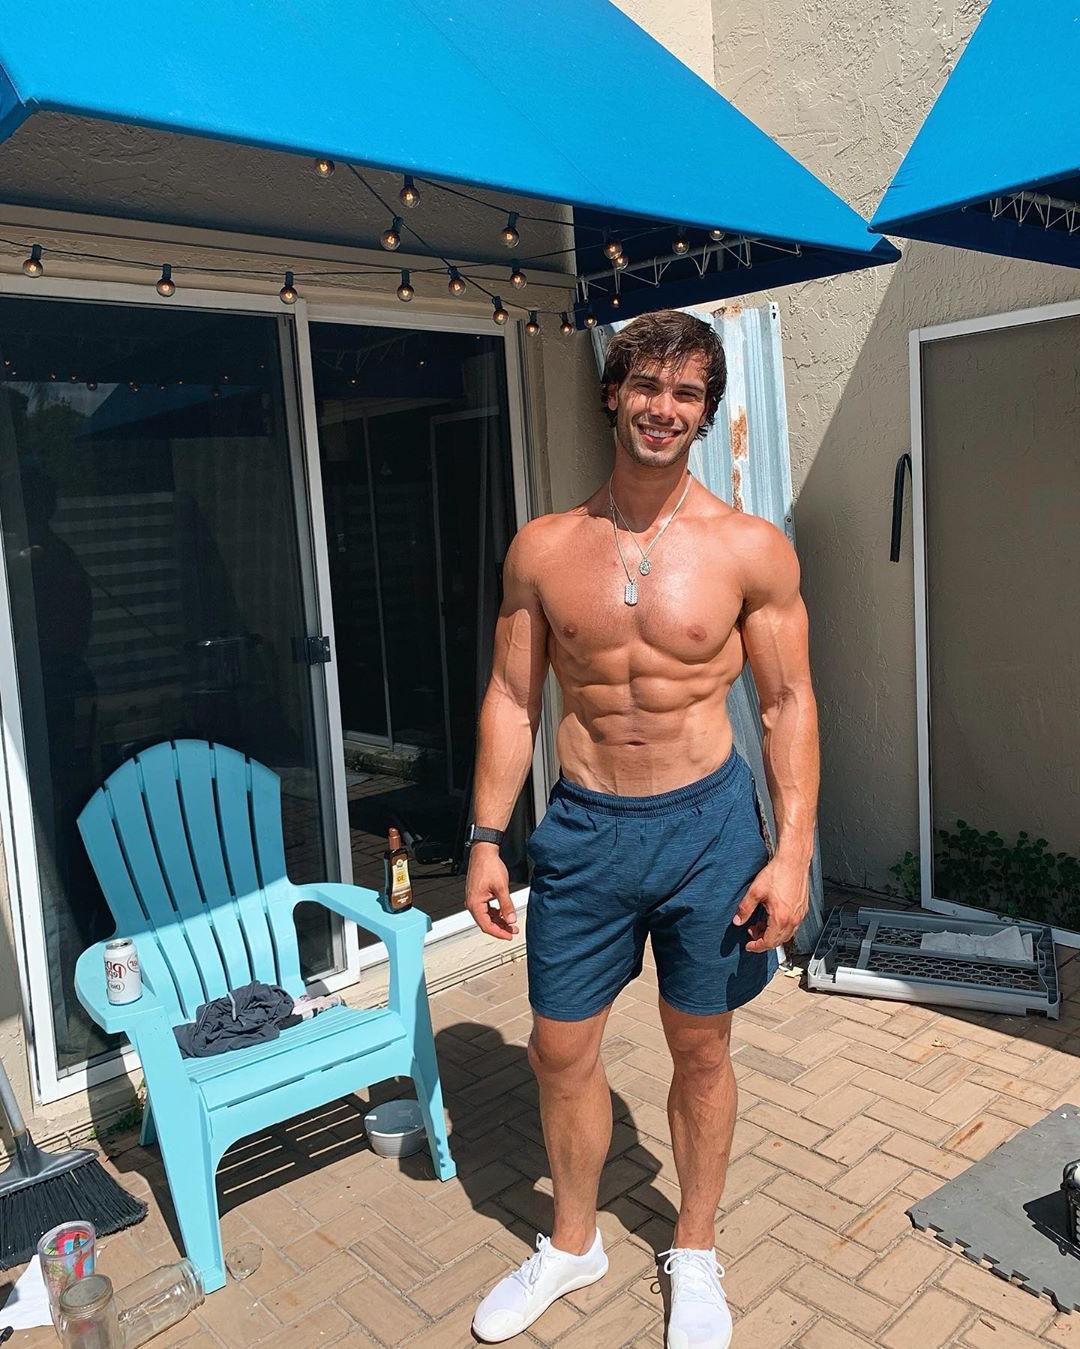 cute-fit-shirtless-muscular-guys-smiling-hunky-boy-next-door-type-college-hunk